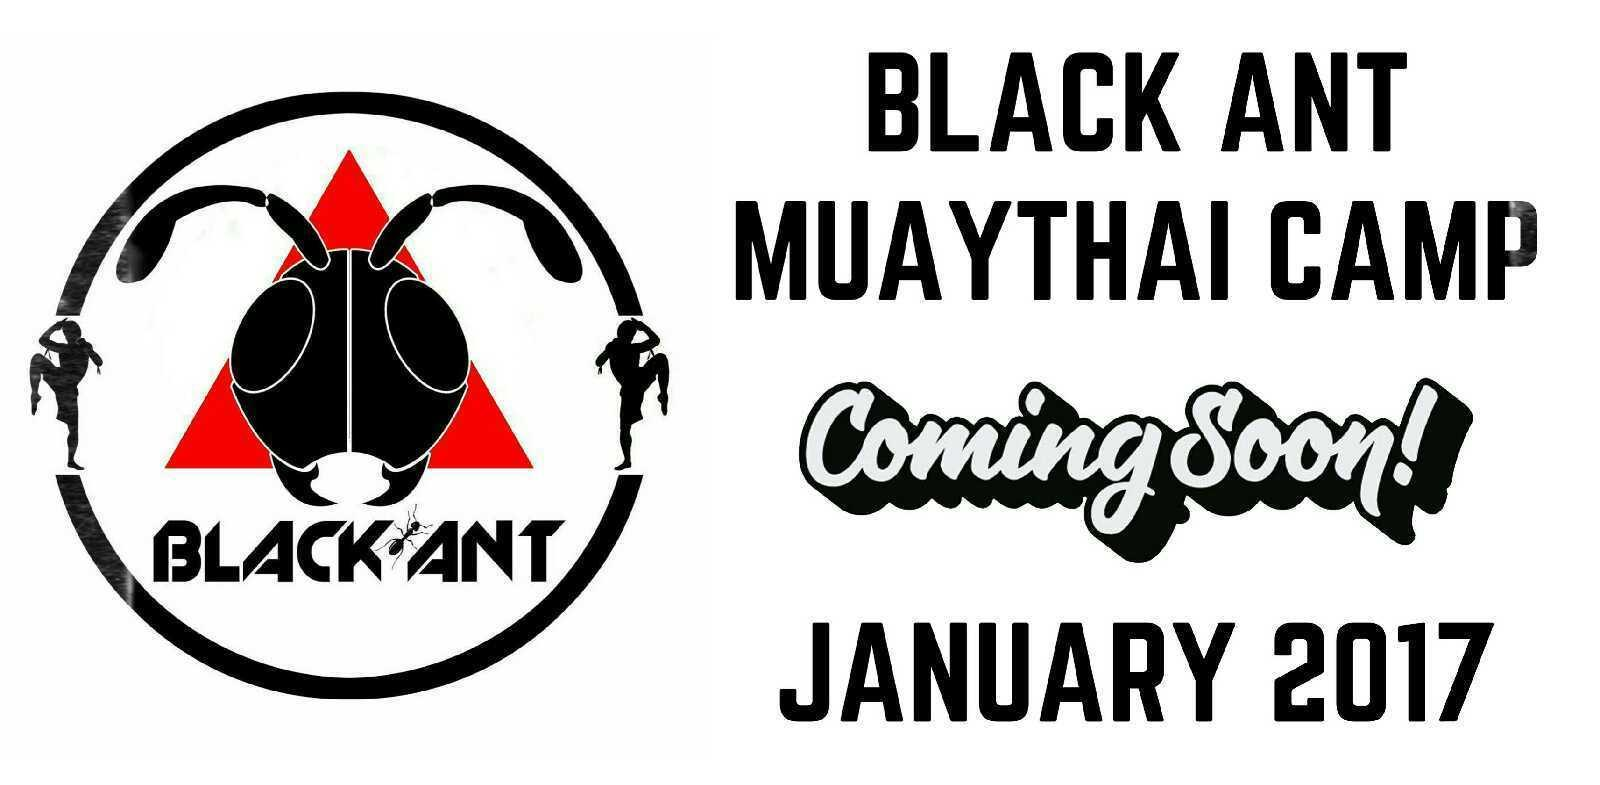 BLACK ANT Muaythai Camp